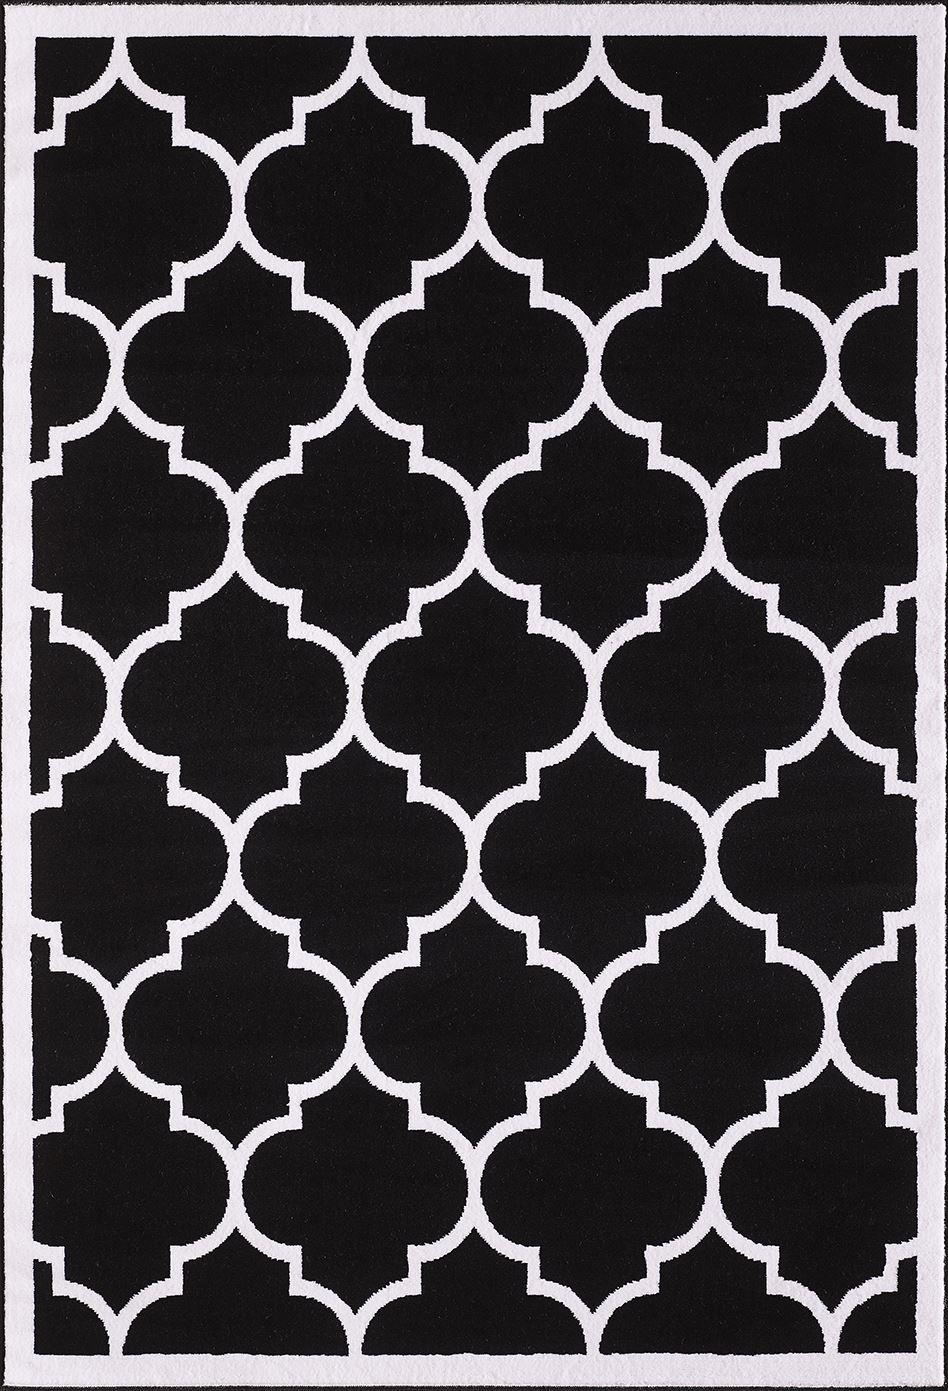 Large-Modern-Classic-Trellis-INDOOR-RUGS-Coloured-Floor-Carpet-Outdoor-Rug-Mats thumbnail 15